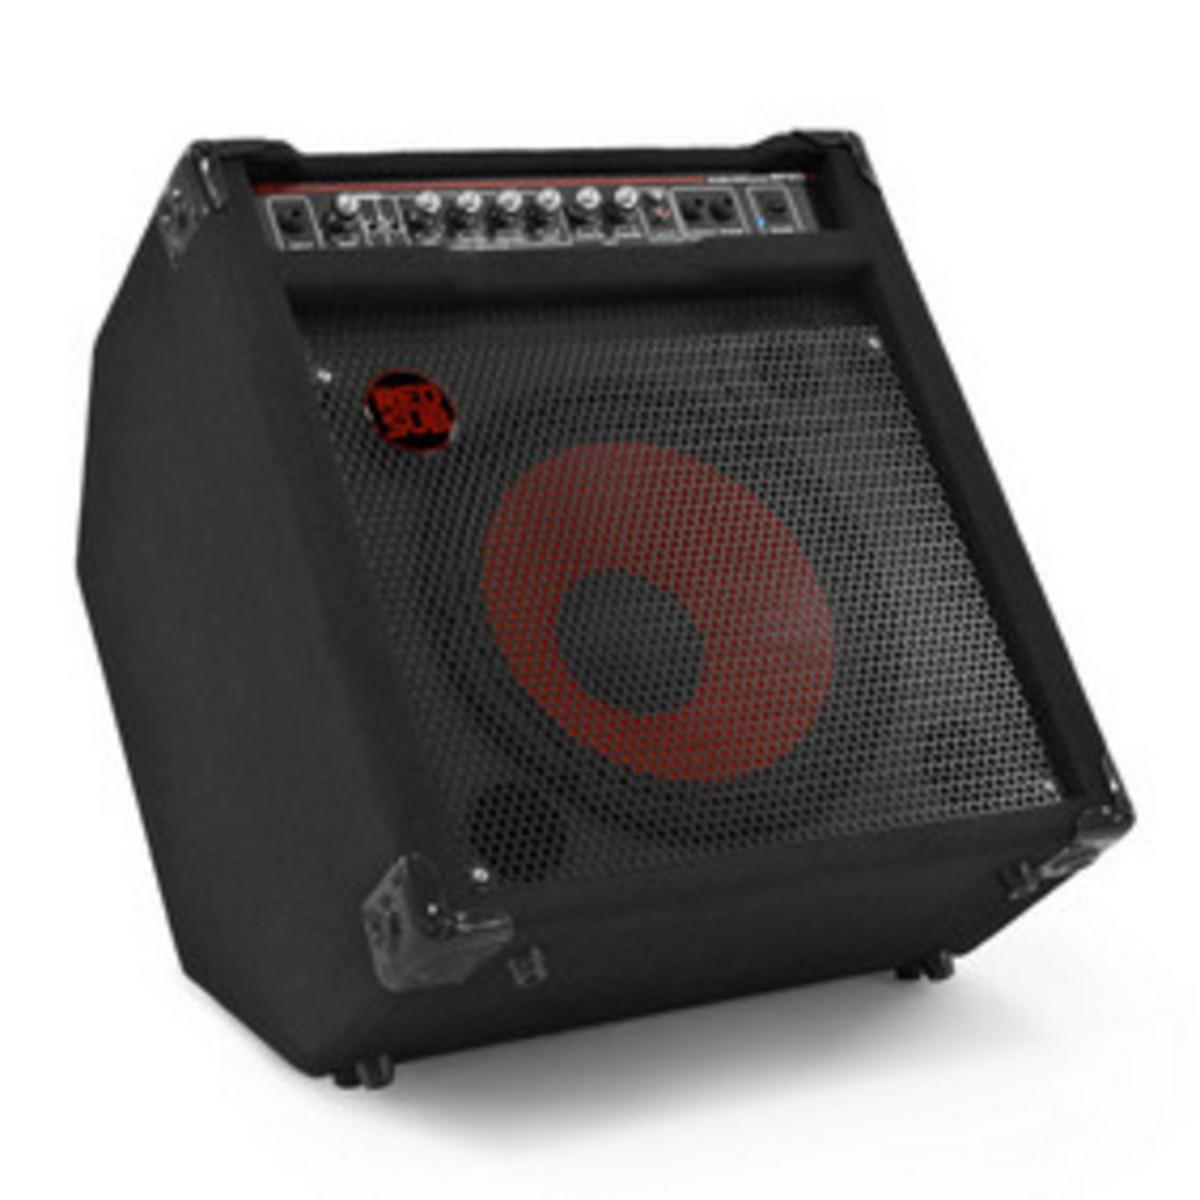 Citaten Enkele Of Dubbele Aanhalingstekens : G m test product op gear music